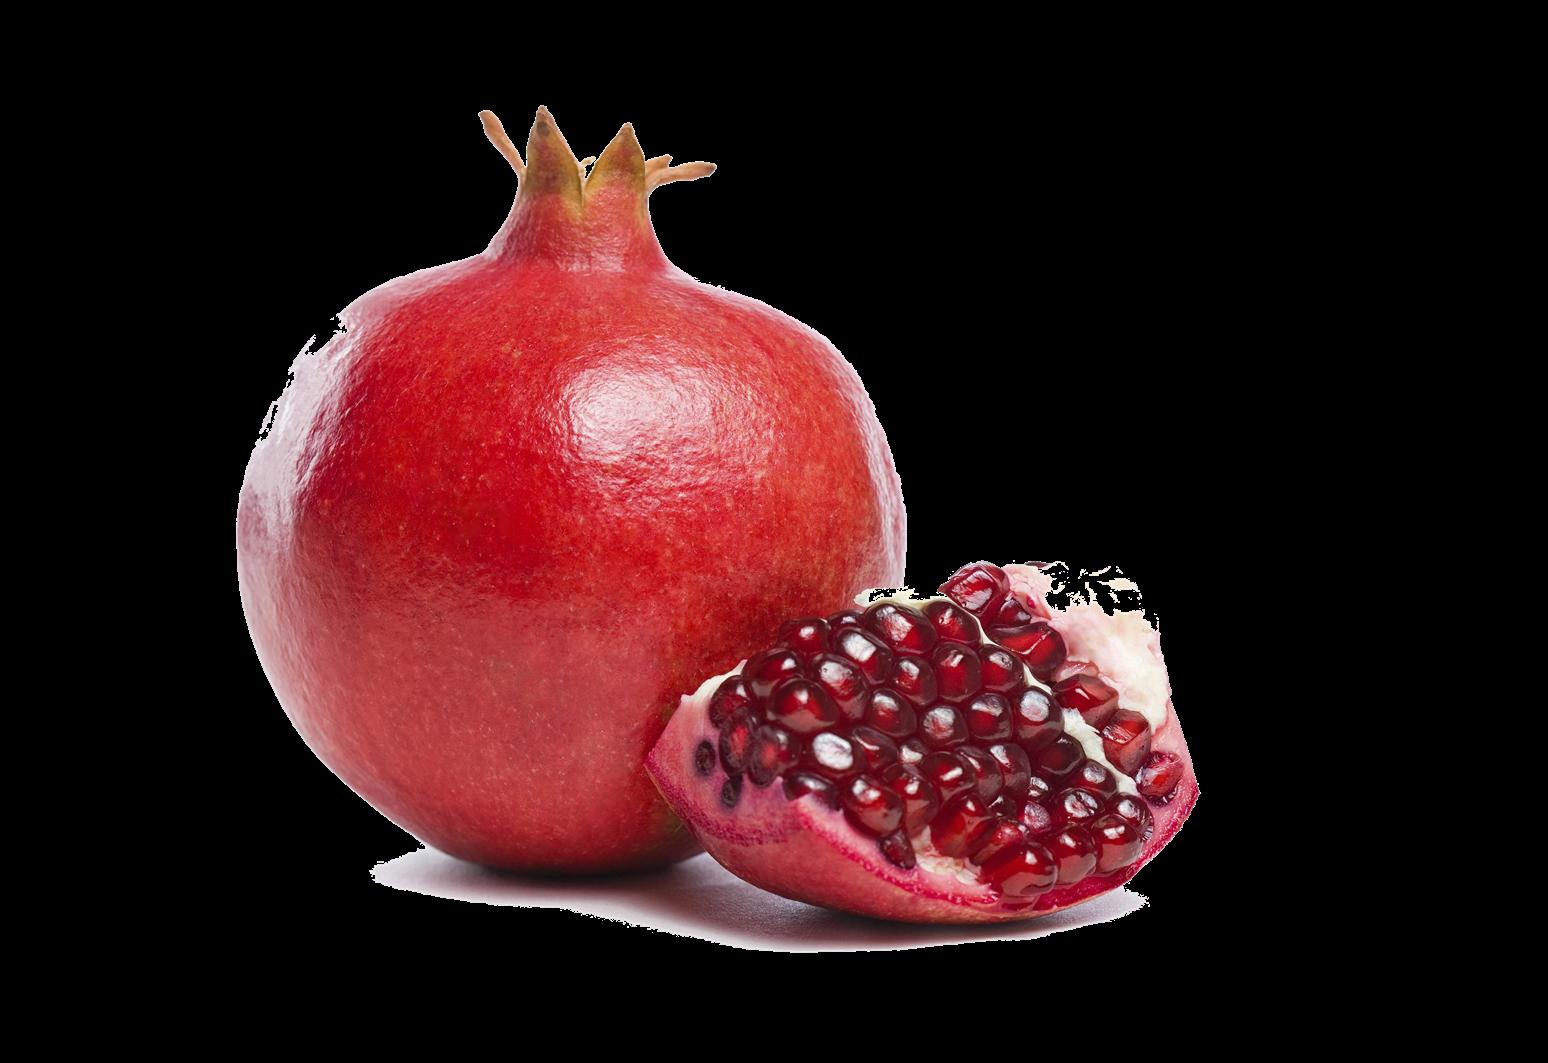 Pomegranate PNG Transparent Image - Pomegranate PNG